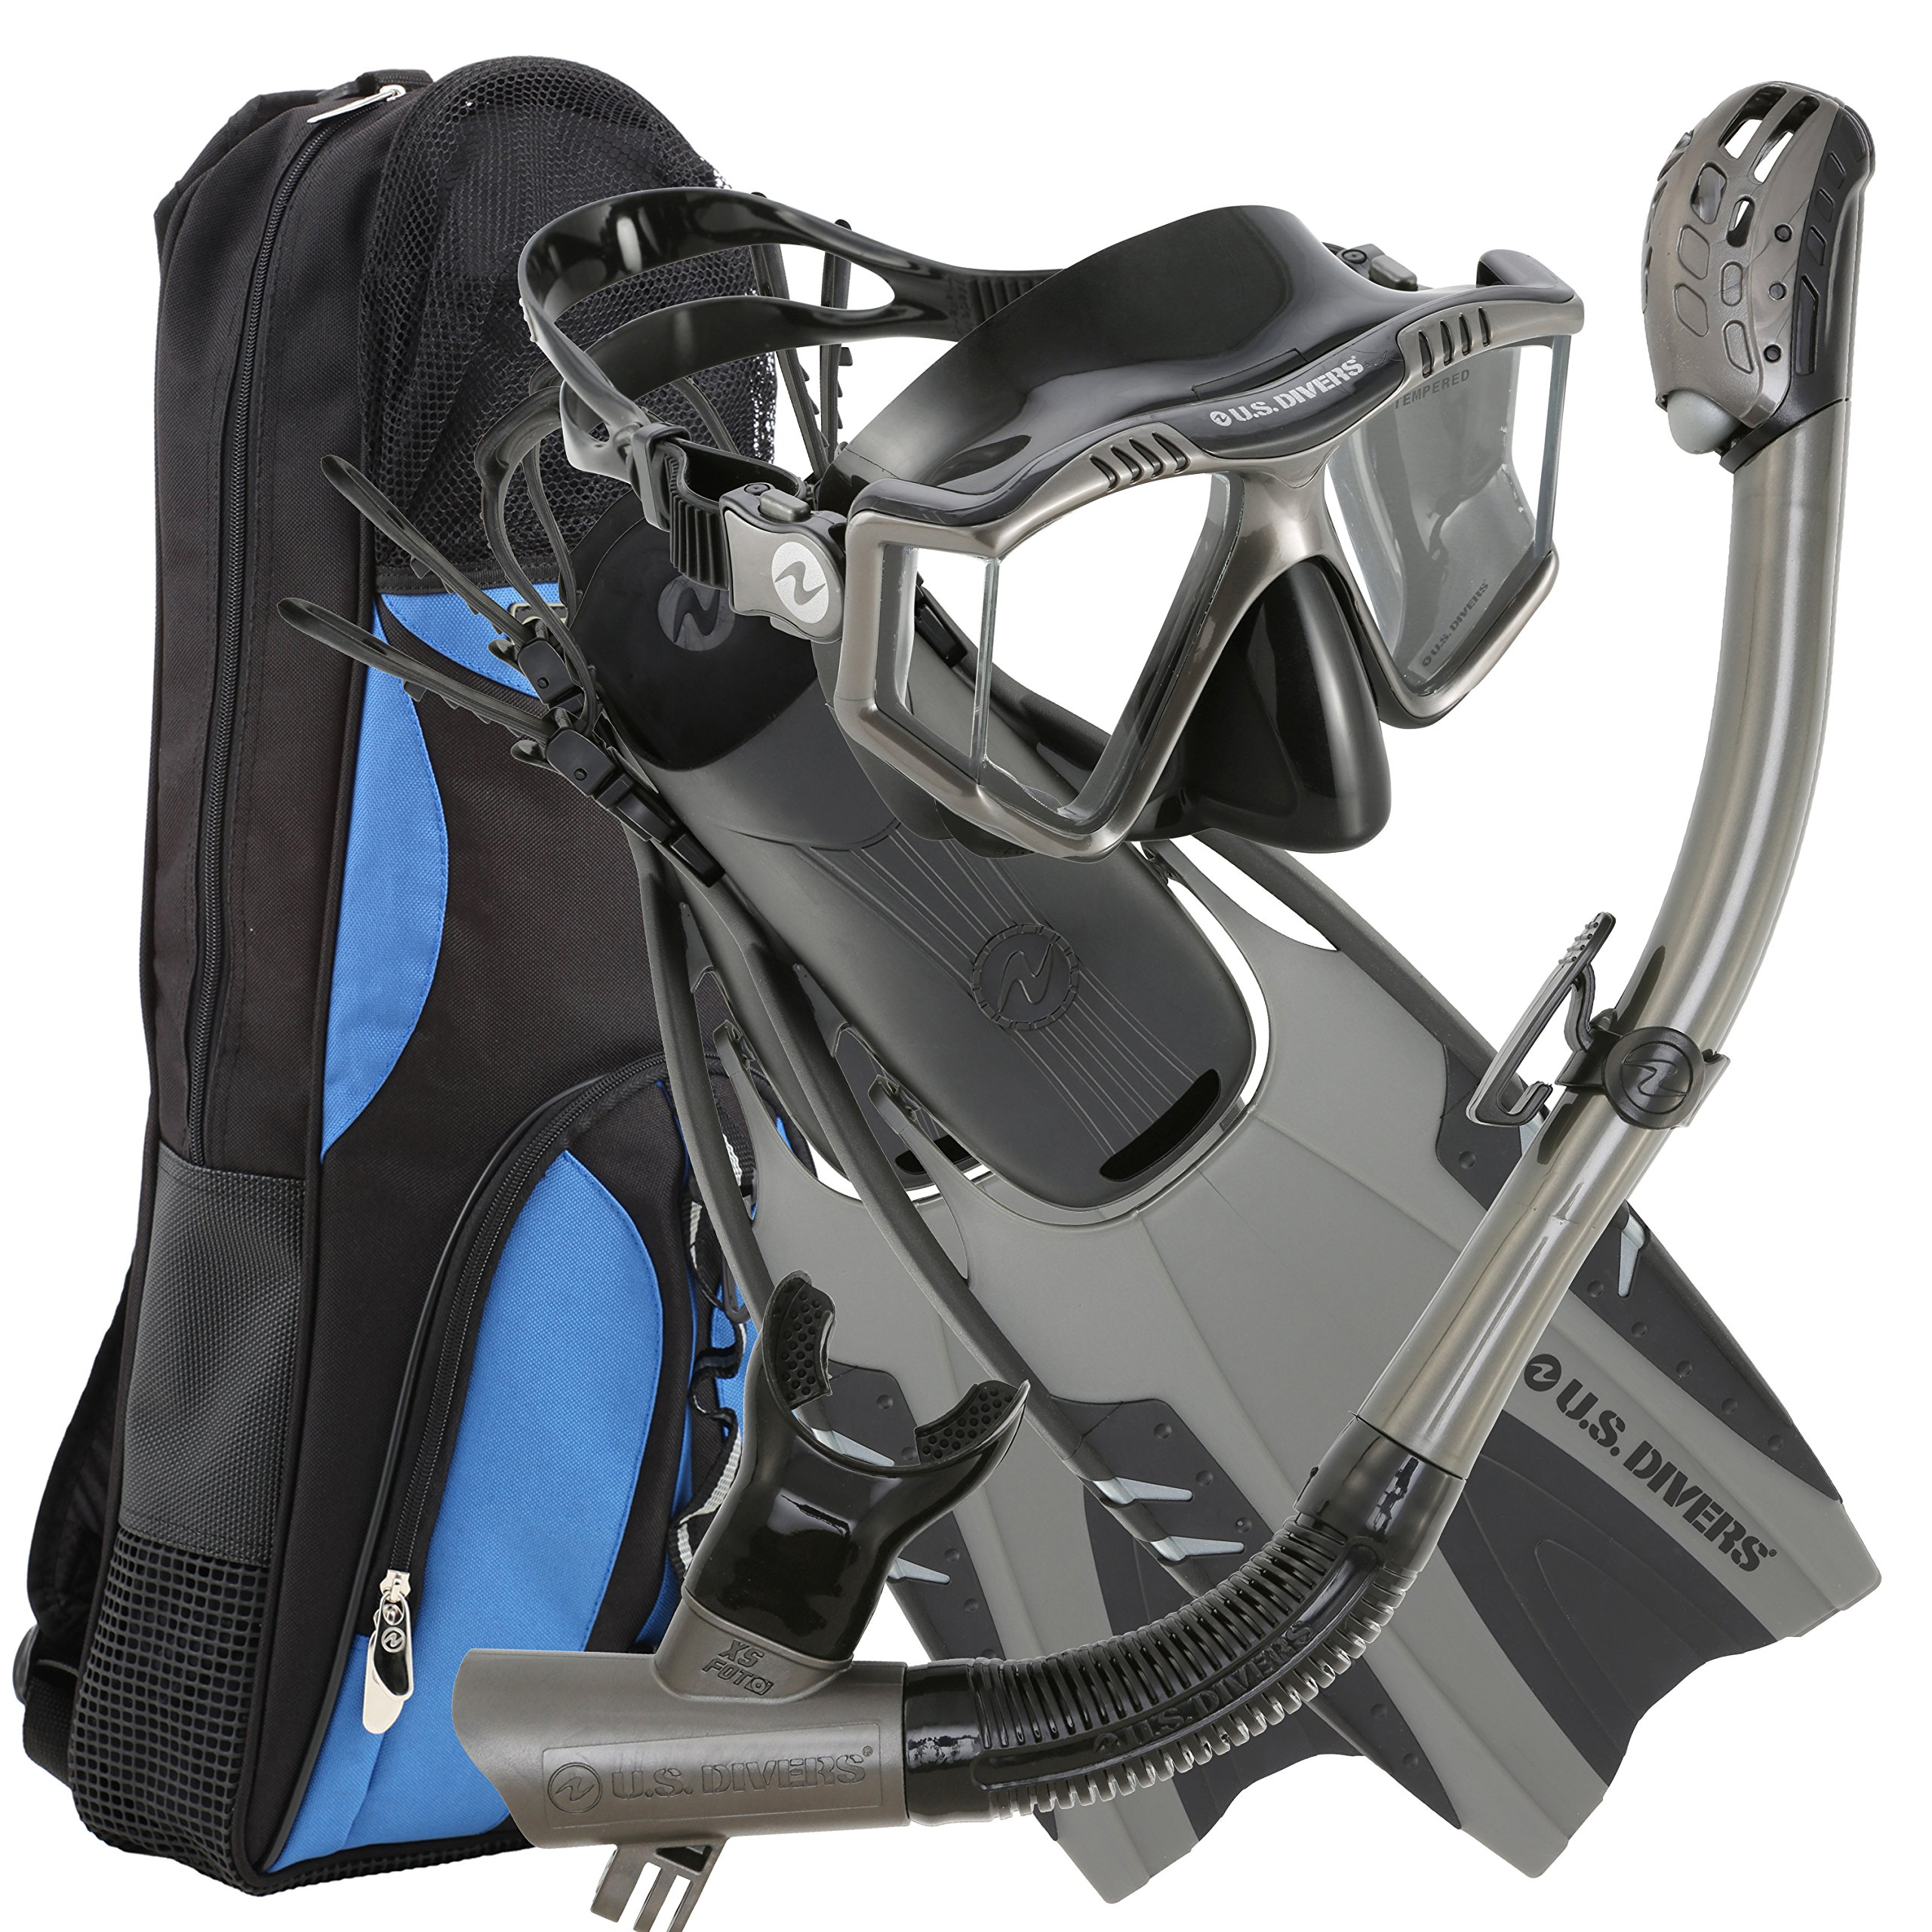 U.S. Divers Lux Platinum Snorkeling Set - Panoramic View Mask, Pivot Fins, GoPro Ready Dry Top Snorkel + Gear Bag, Gun Metal L/LX by U.S. Divers